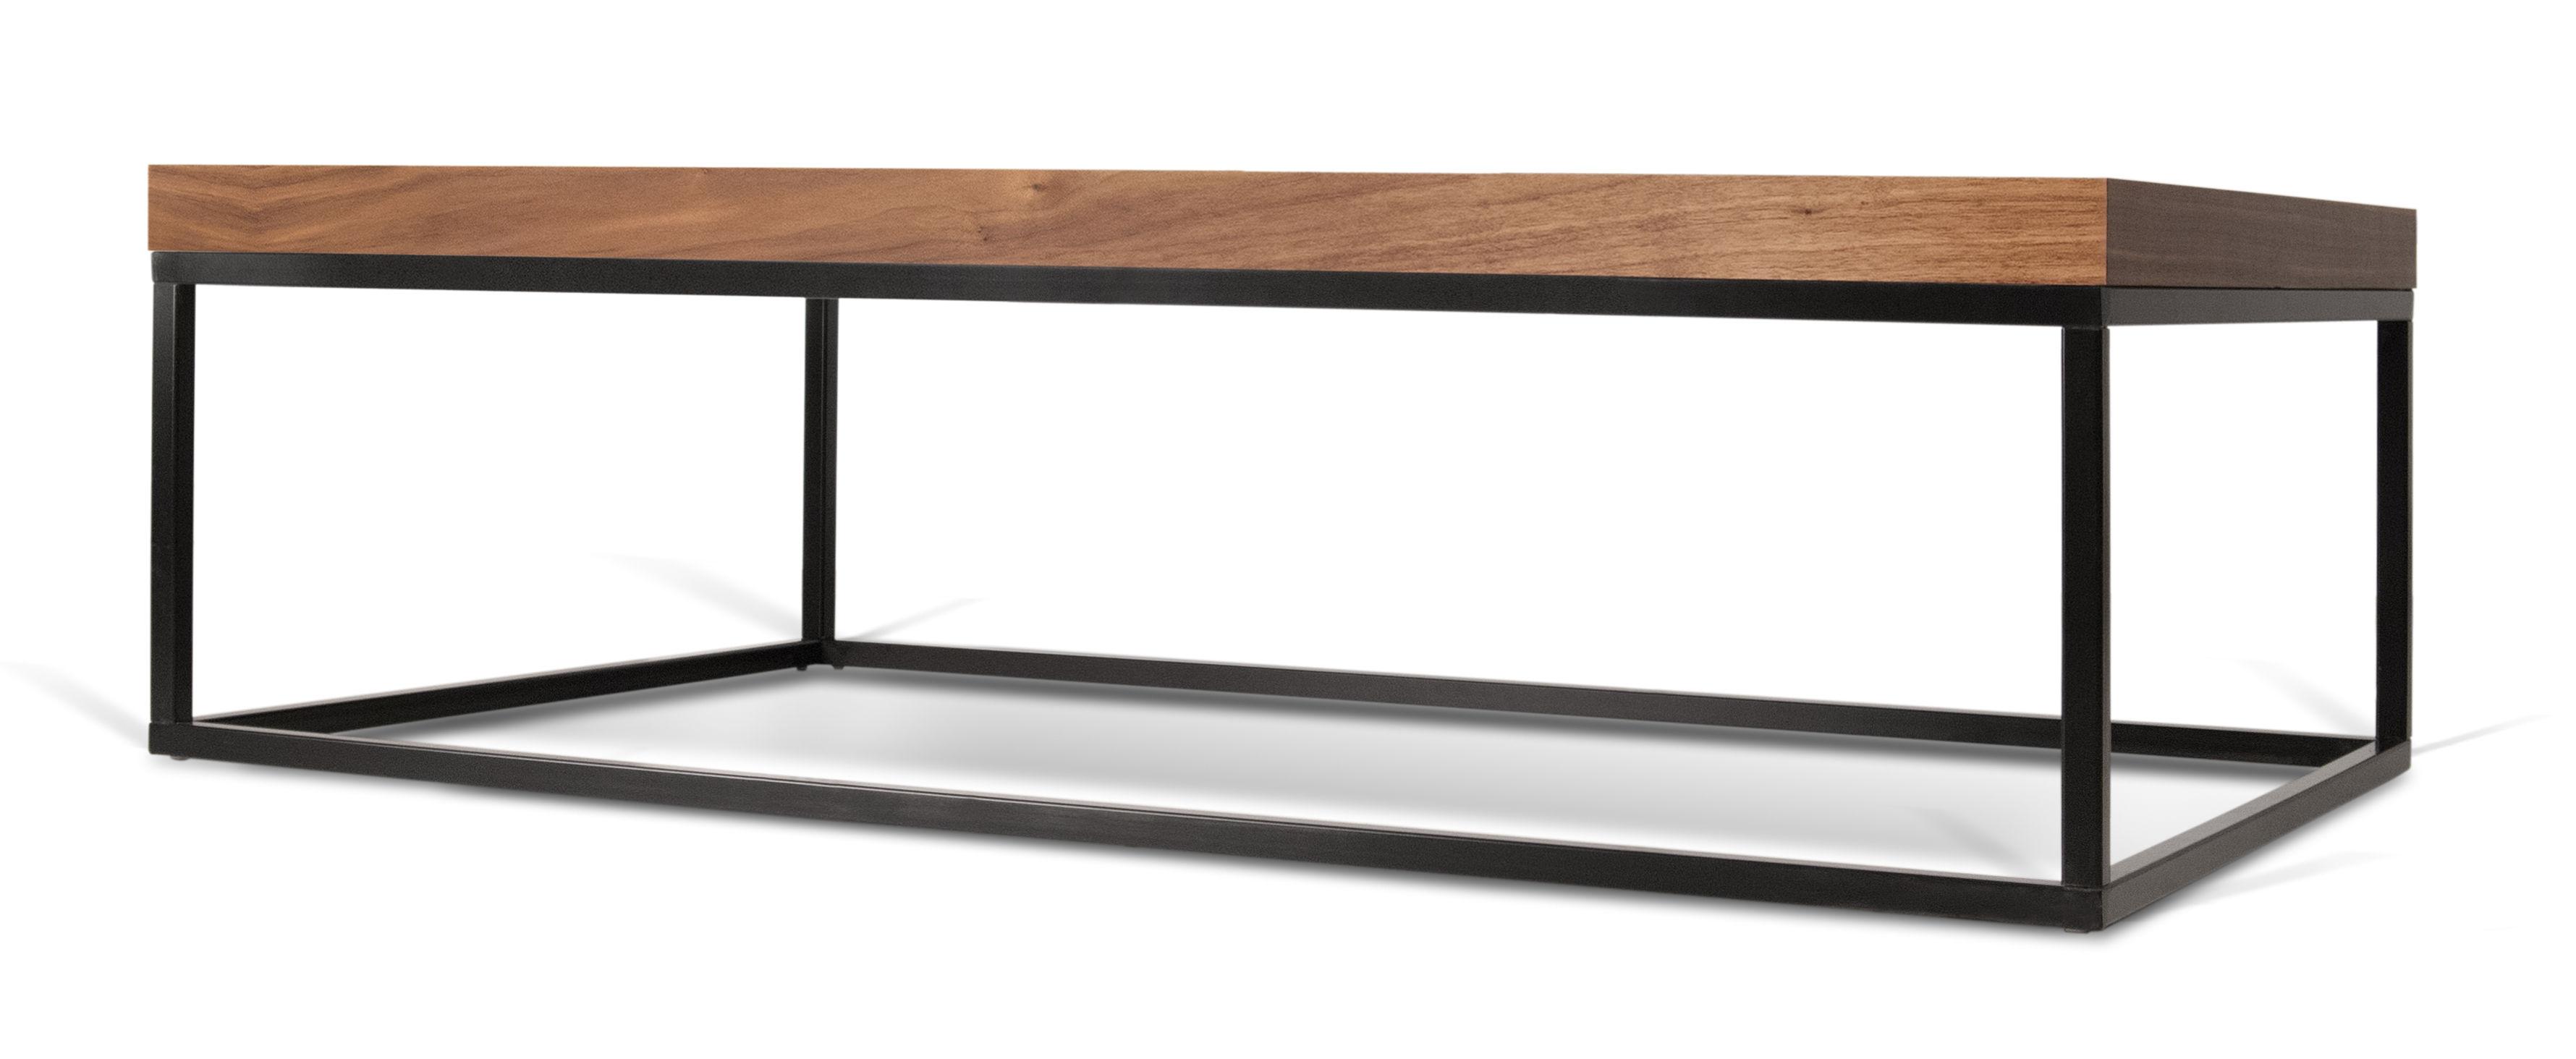 Wallnut Coffee Table Walnut Walnut Black Leg By Pop Up Home